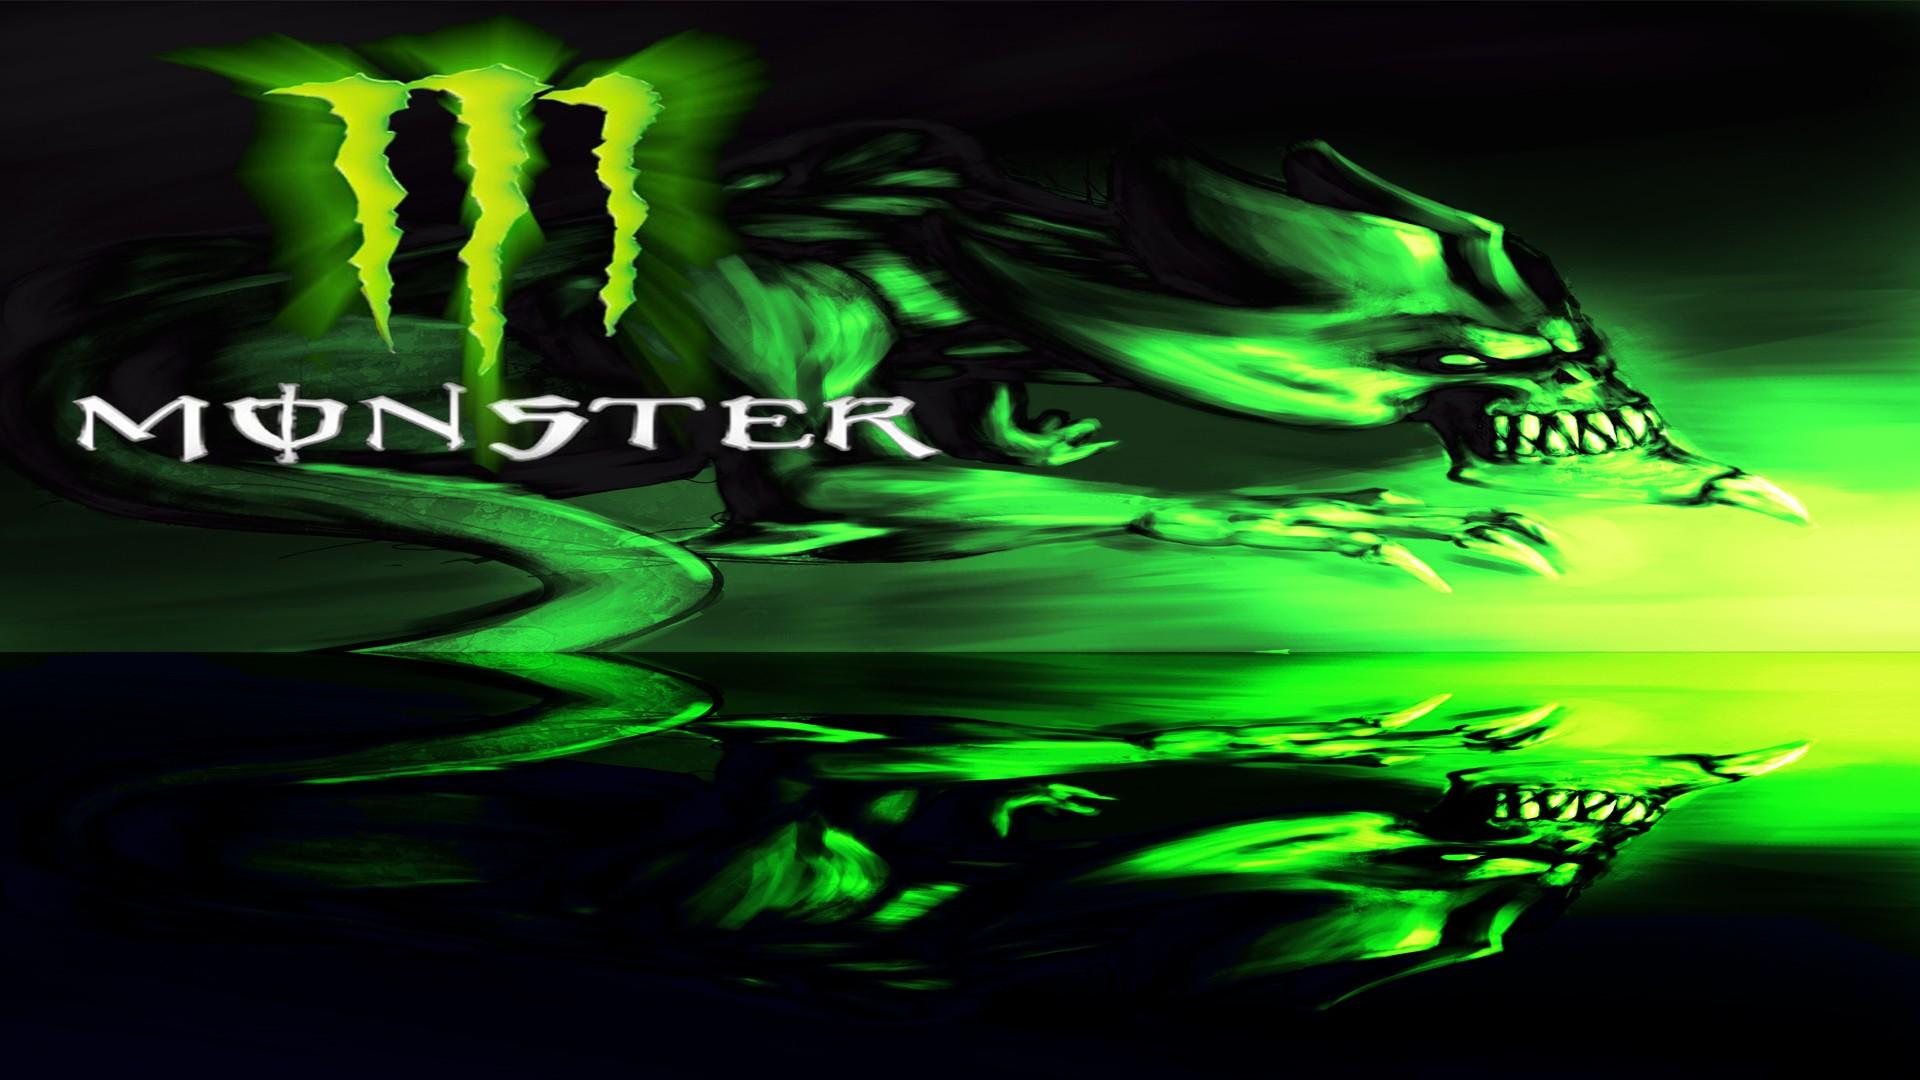 ... Monster Energy 3D Wallpaper screenshot 4 ...